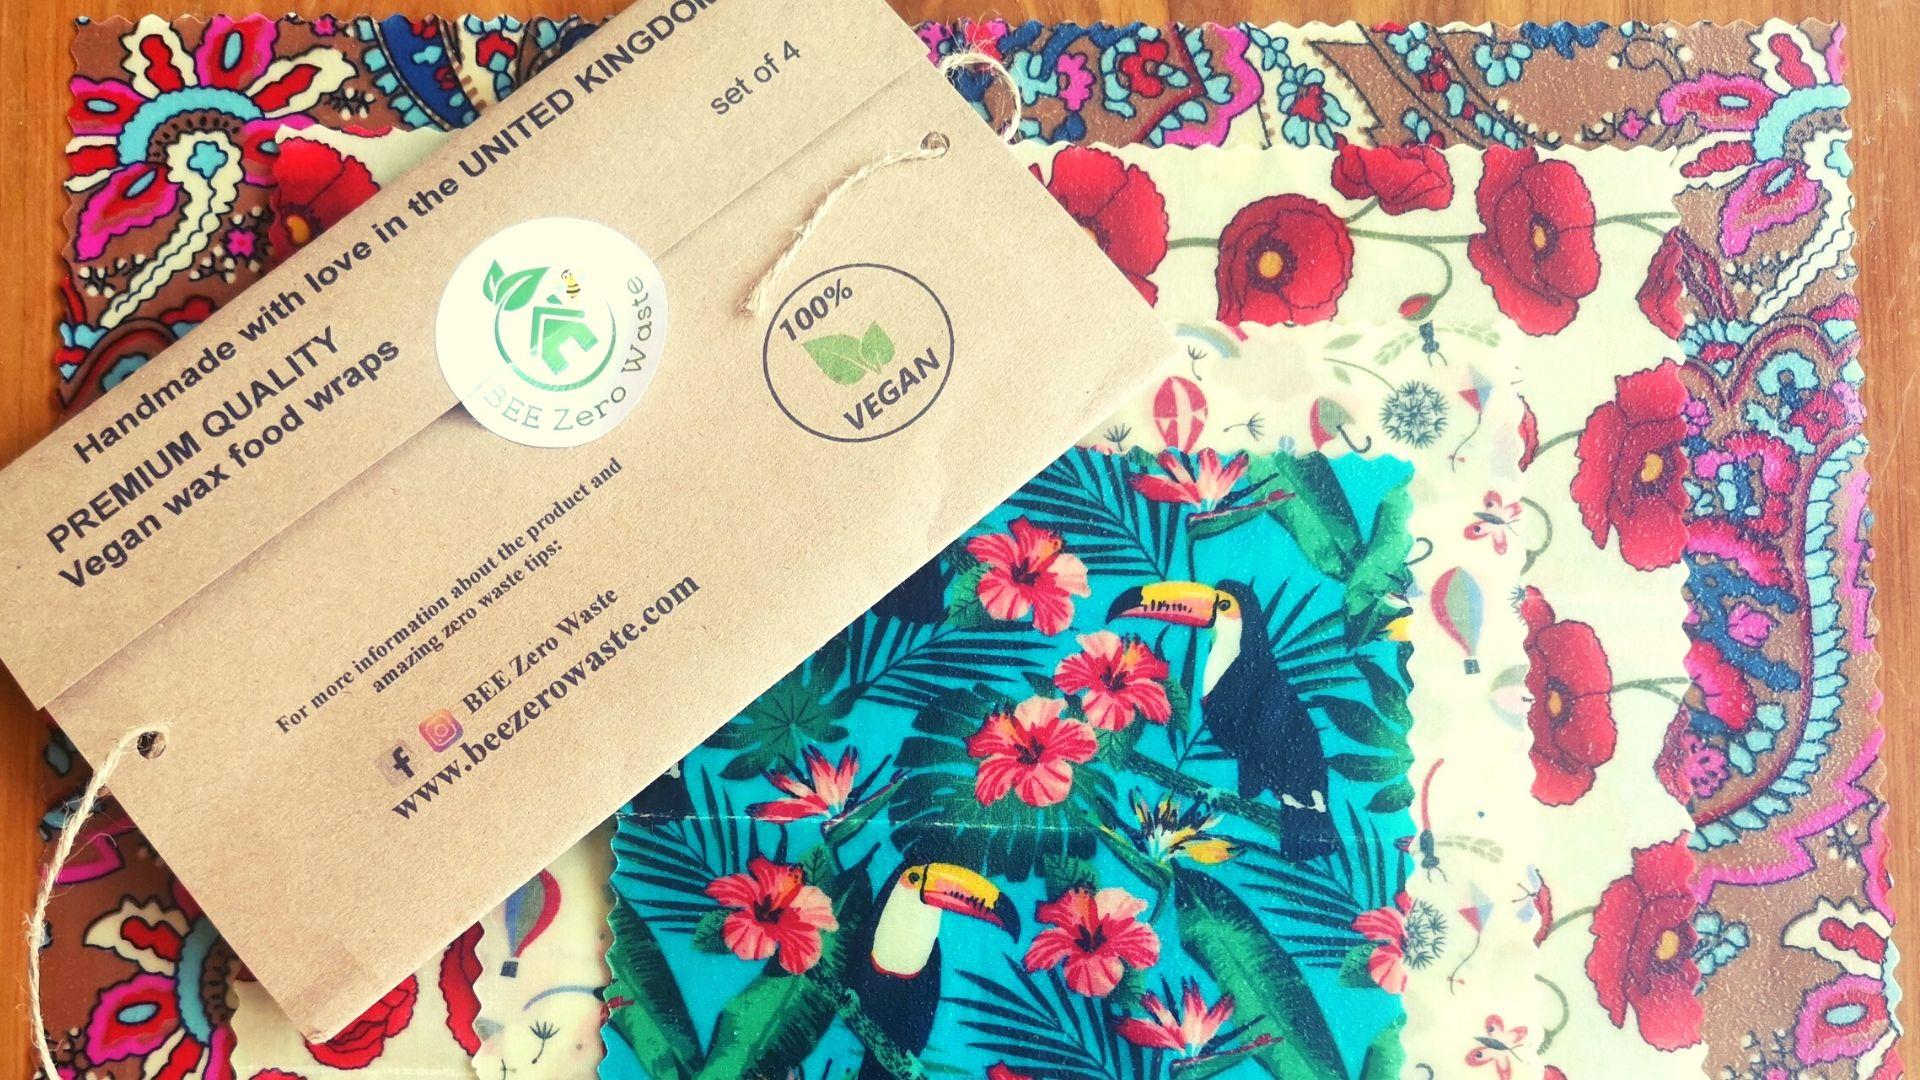 BEE Zero Waste: Vegan Wax, Food Wraps Product Review